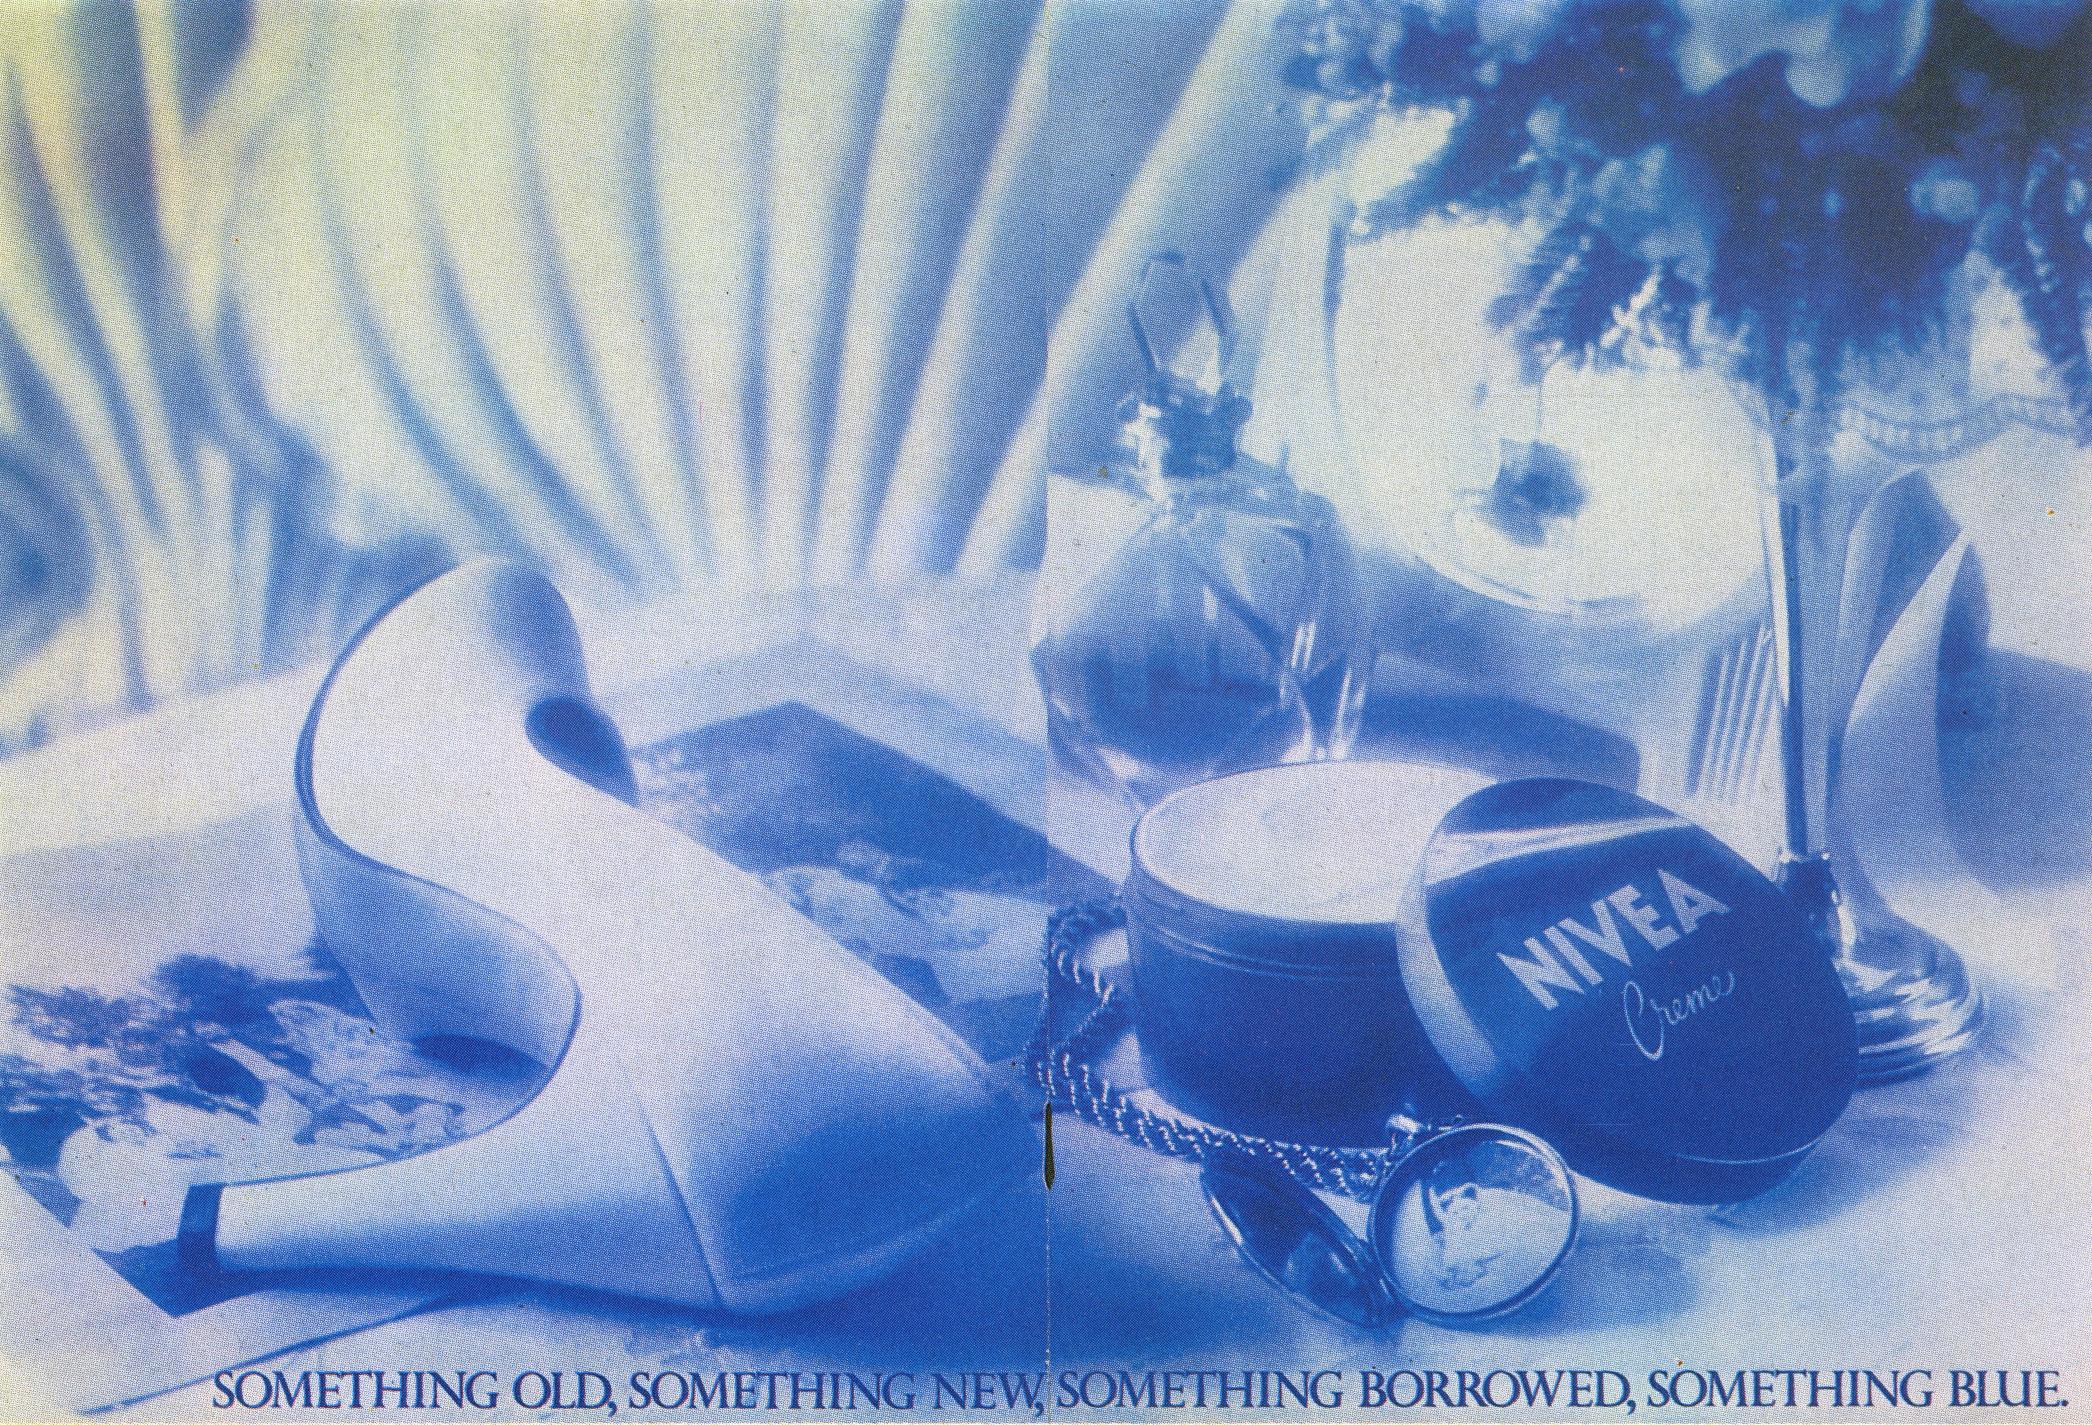 Jeff Stark, Nivea 'Something', Saatchi's-01